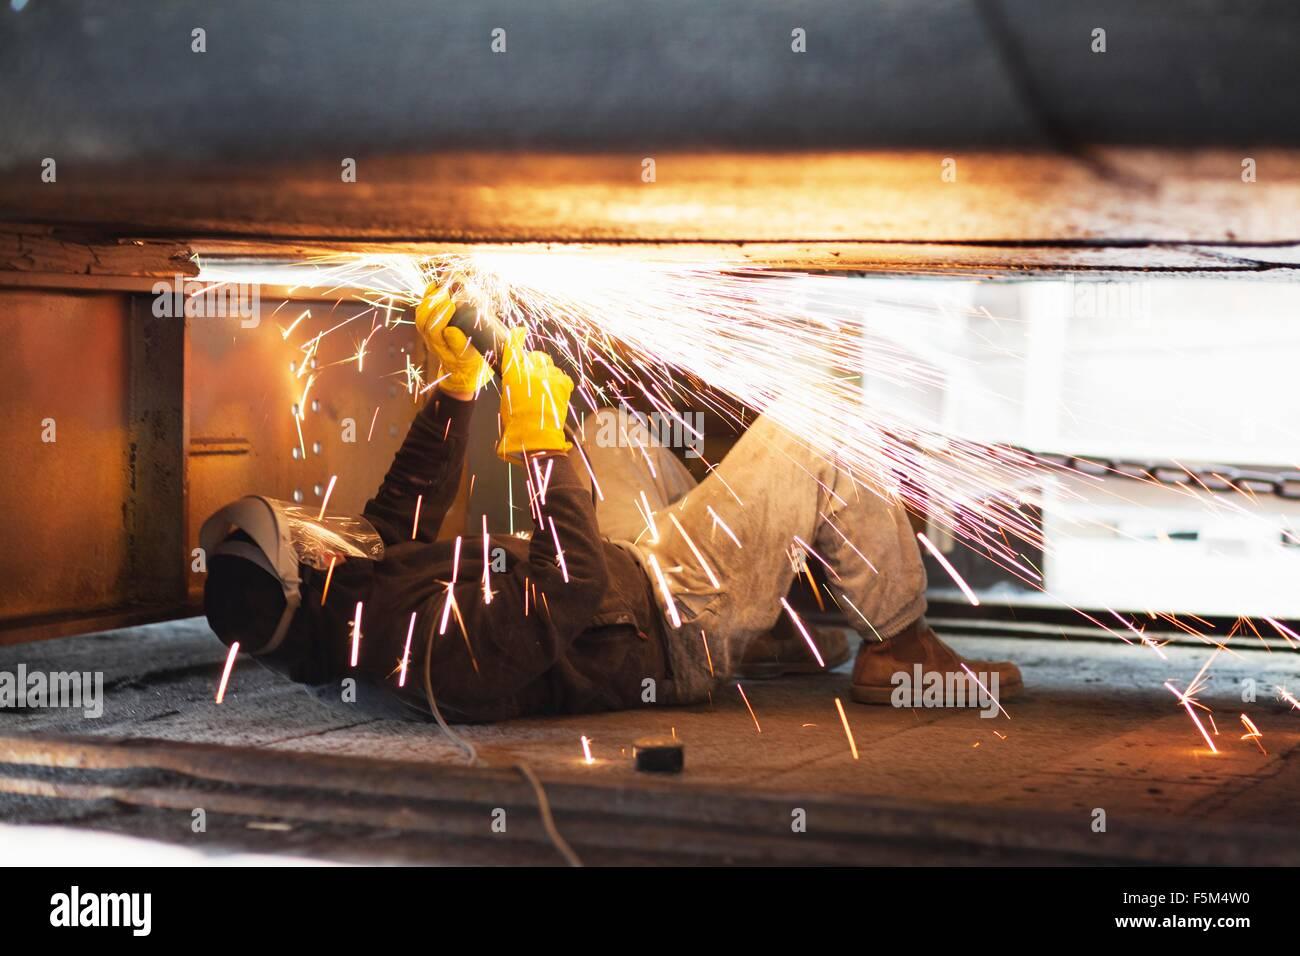 Welder welding beneath boat in shipyard workshop - Stock Image